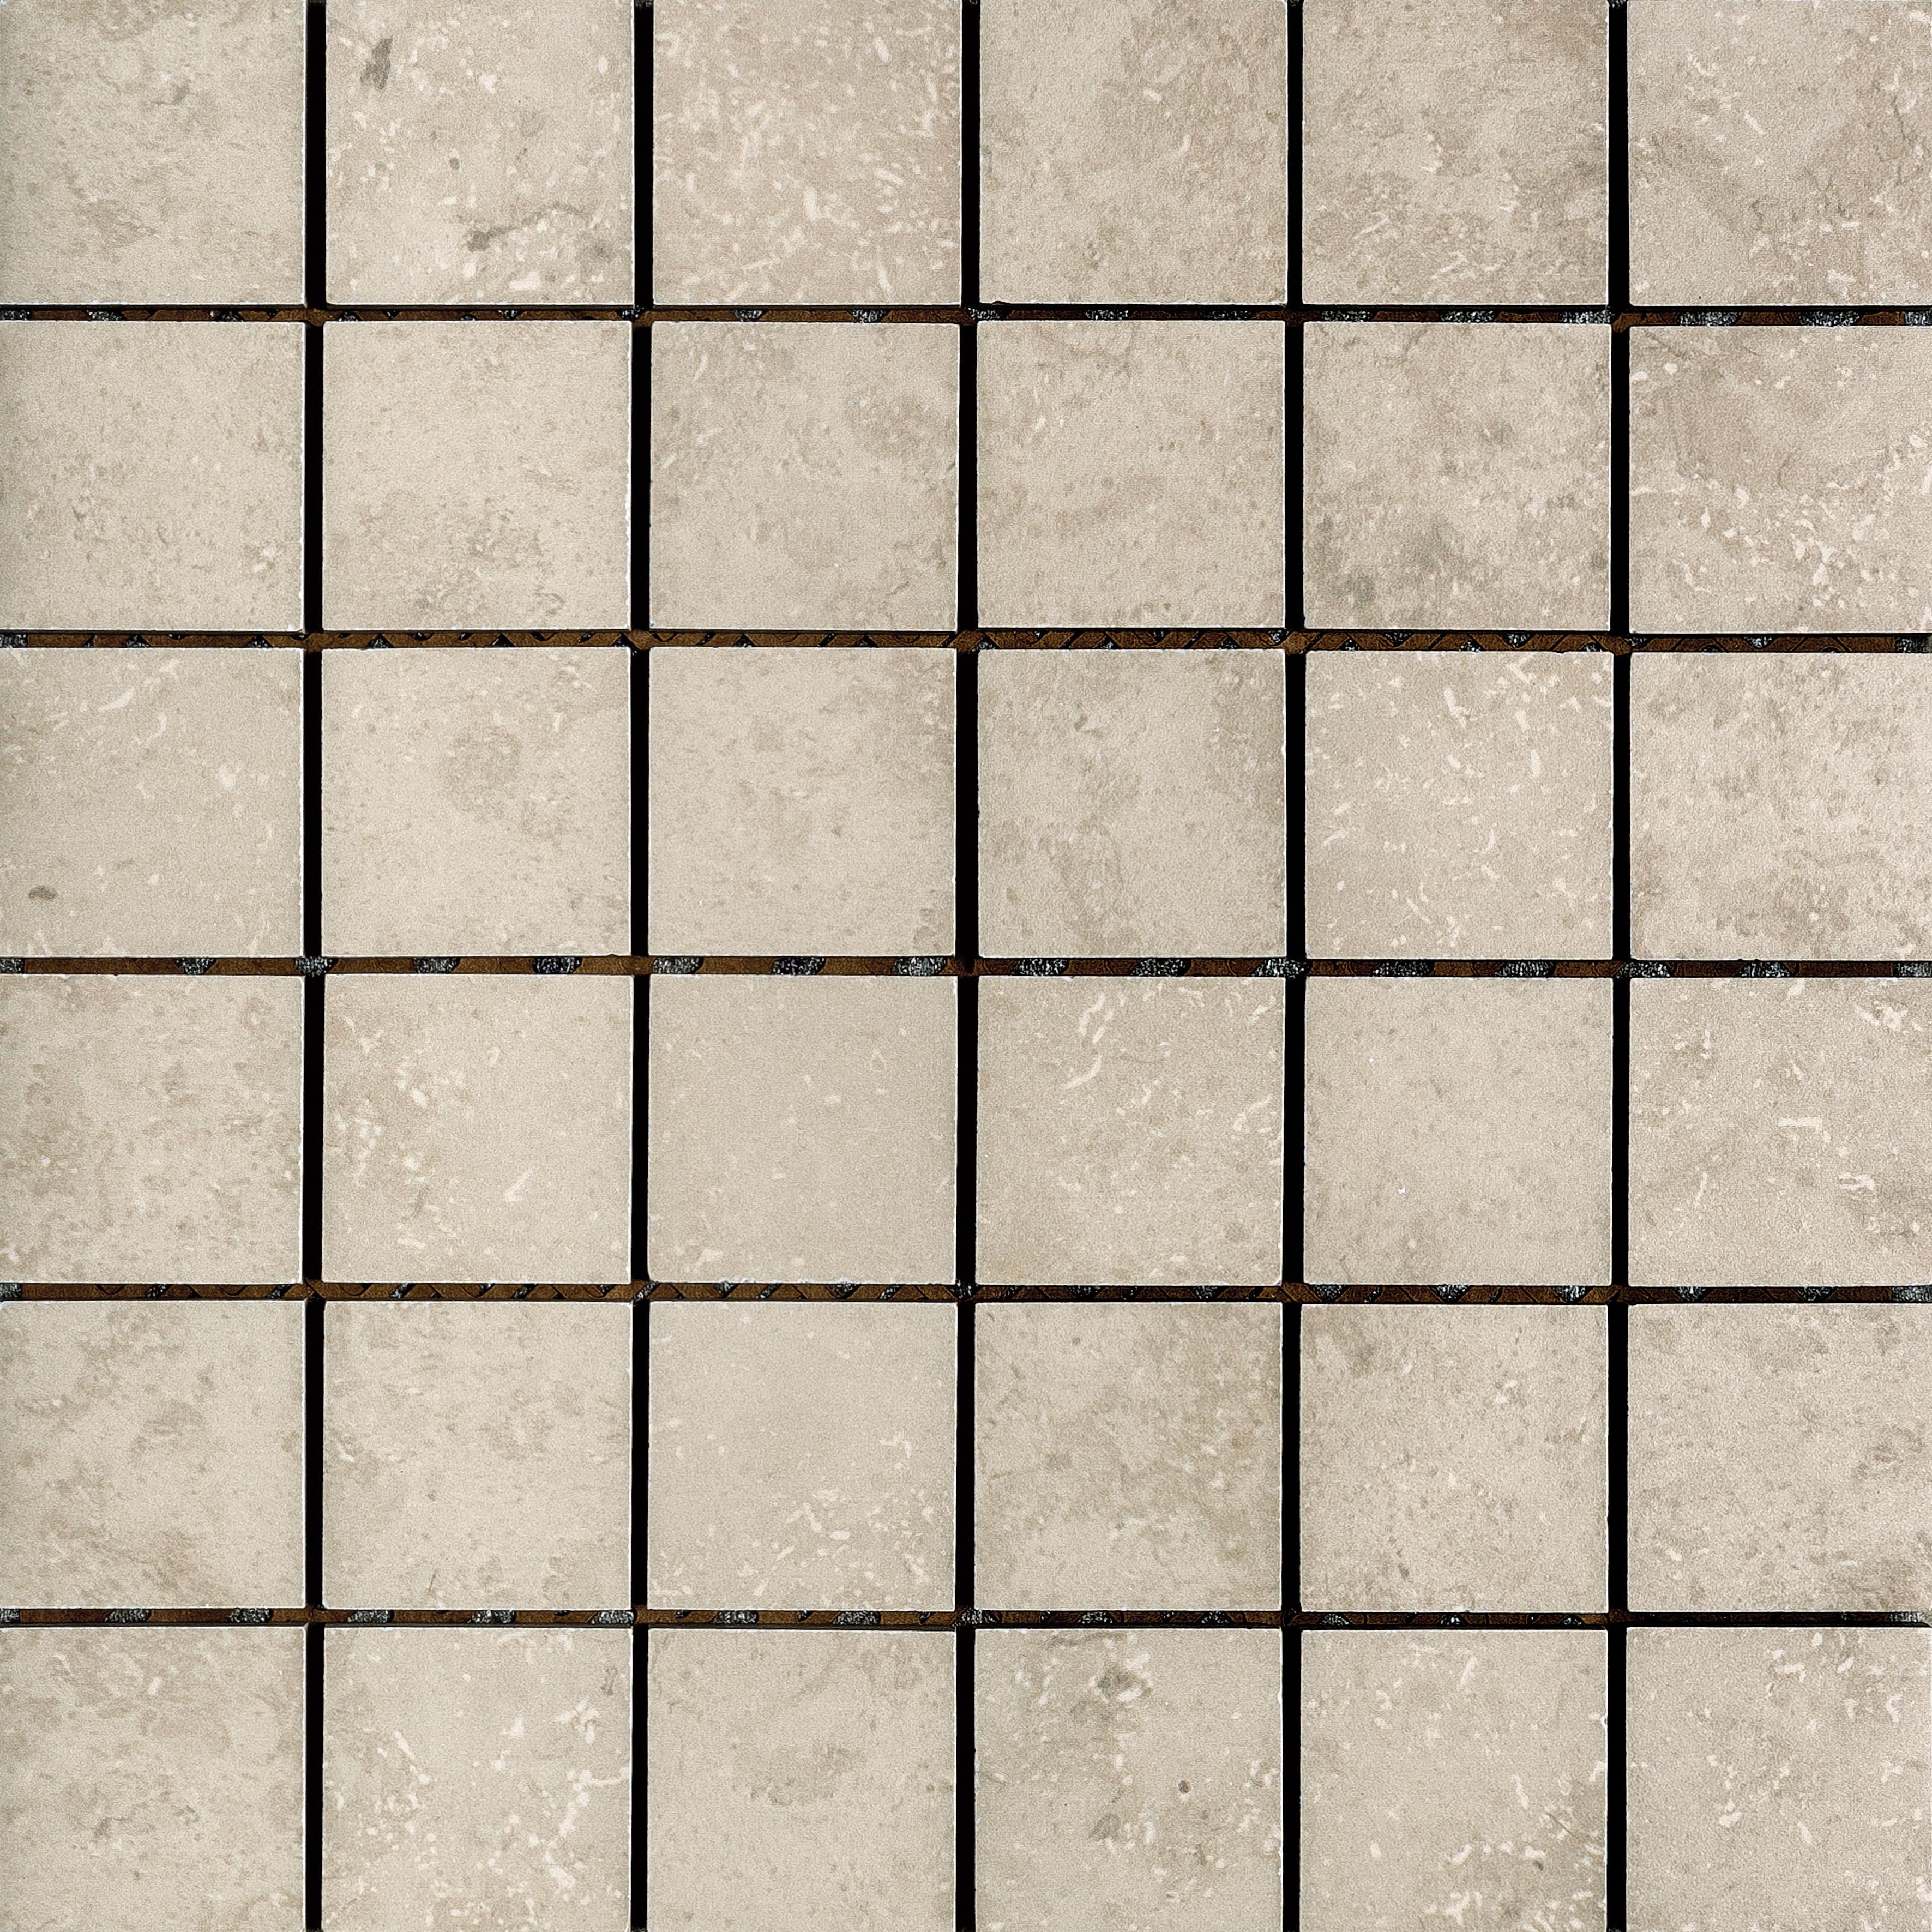 Azulev Fossil Stone Blanco Porcelain Mosaic (300x300mm)